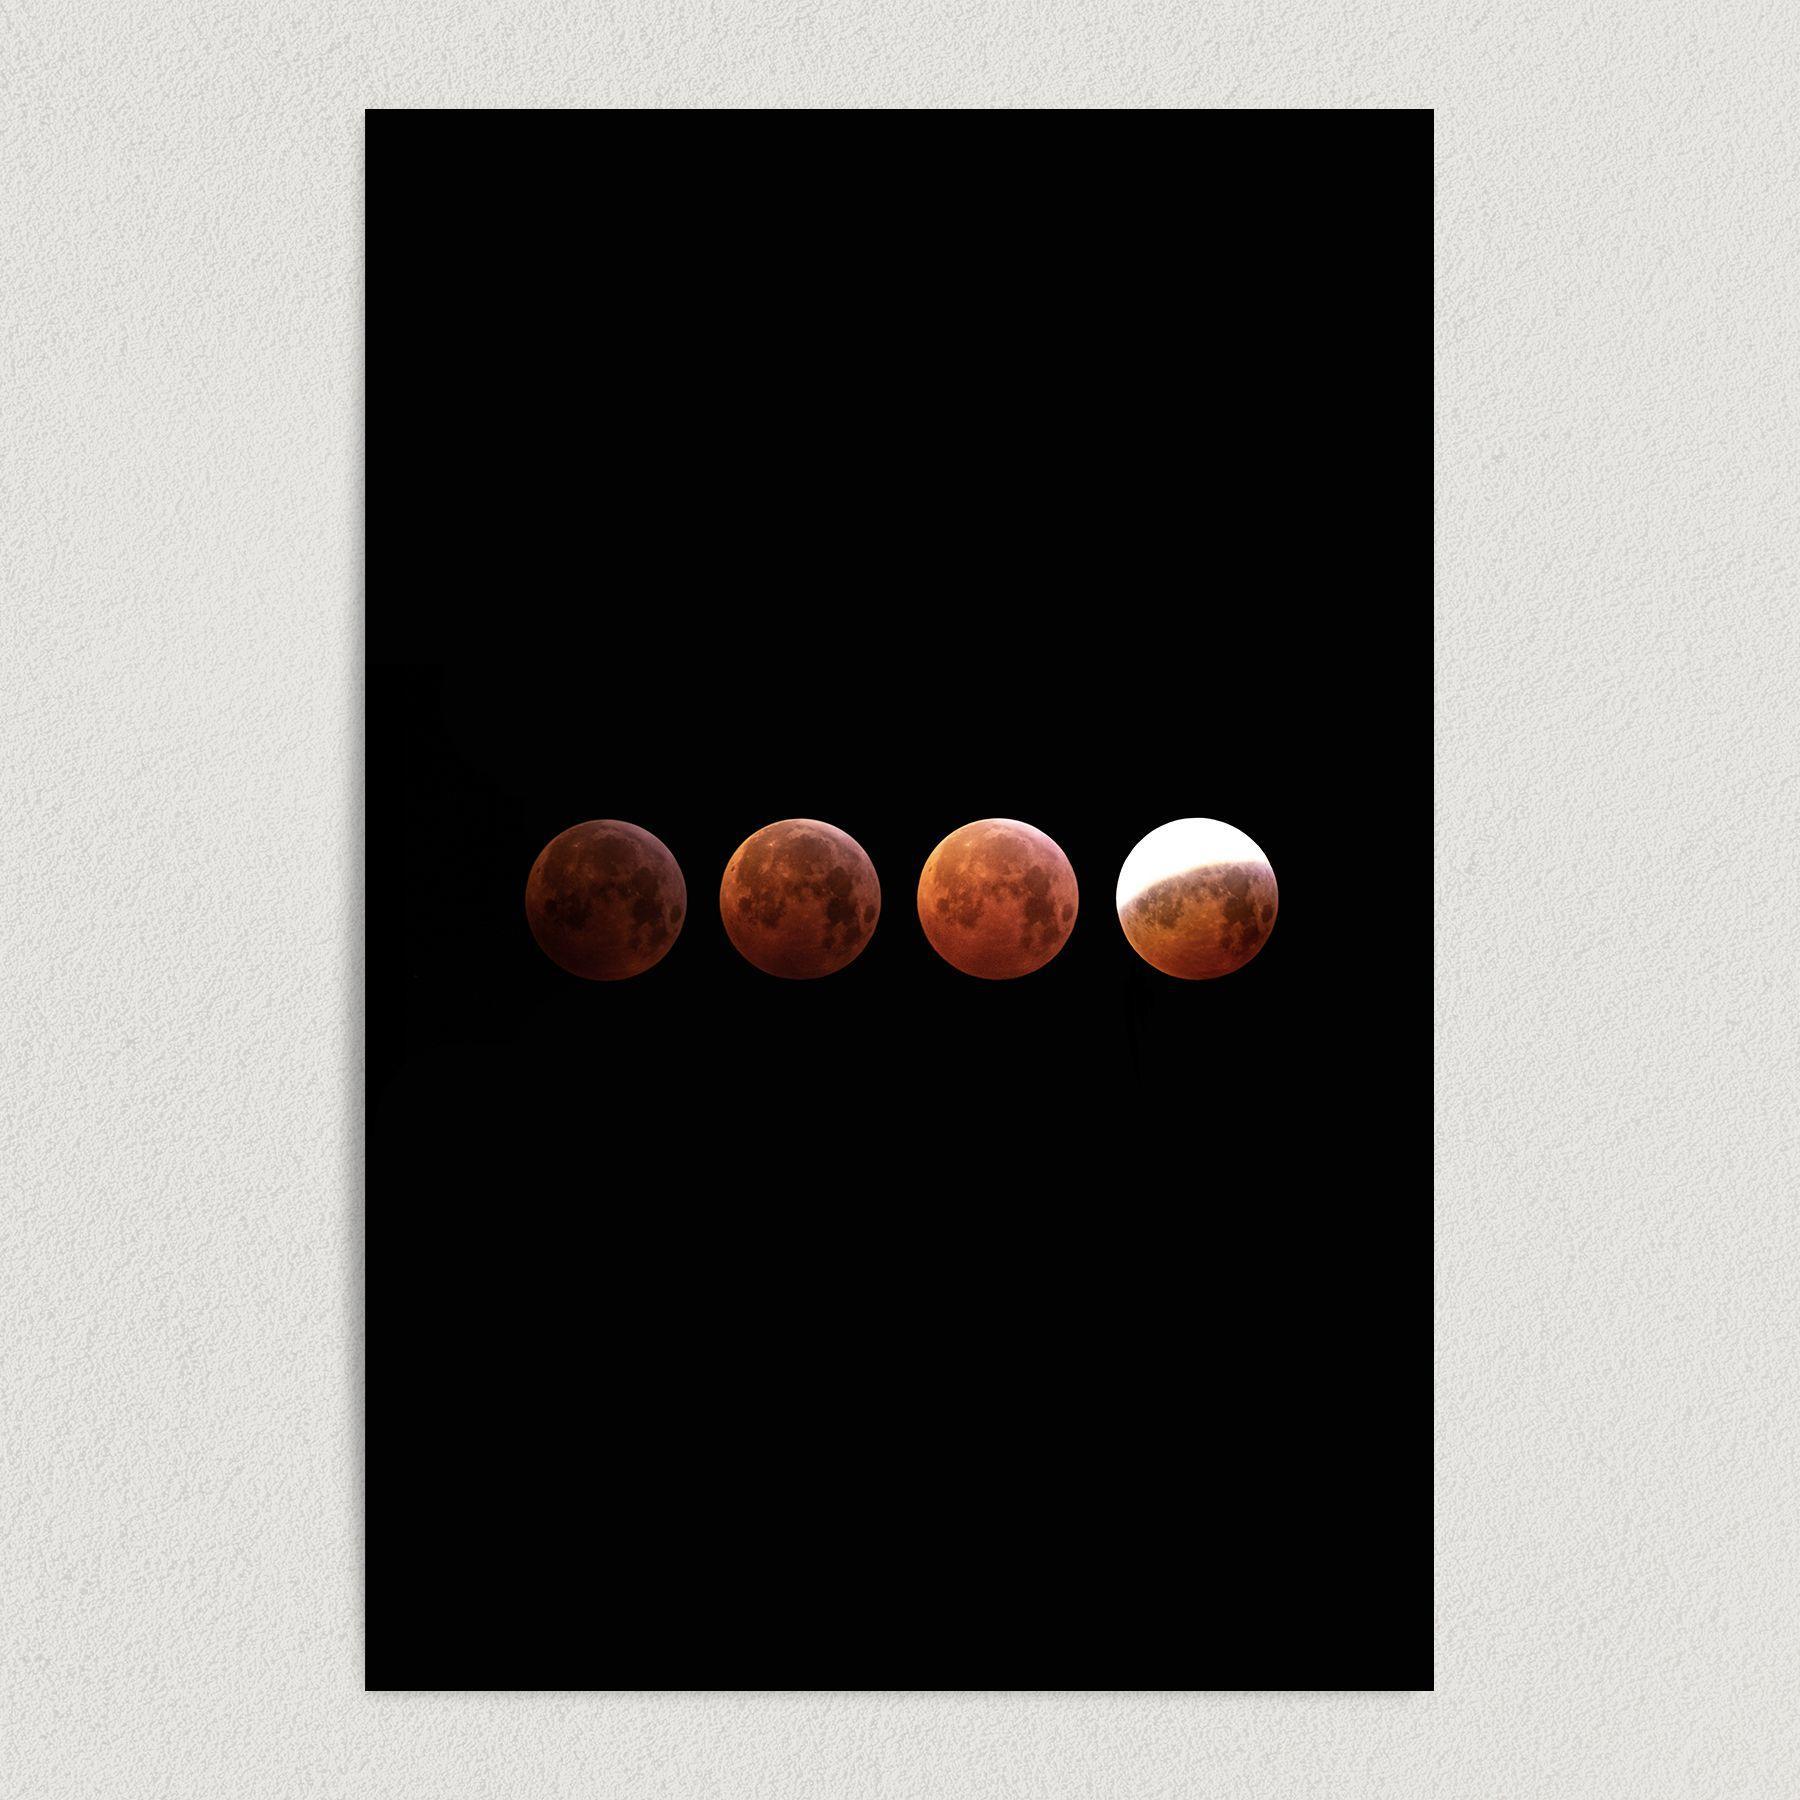 Blood Moon Lunar Eclipse Moon Space Art Print Poster S1008